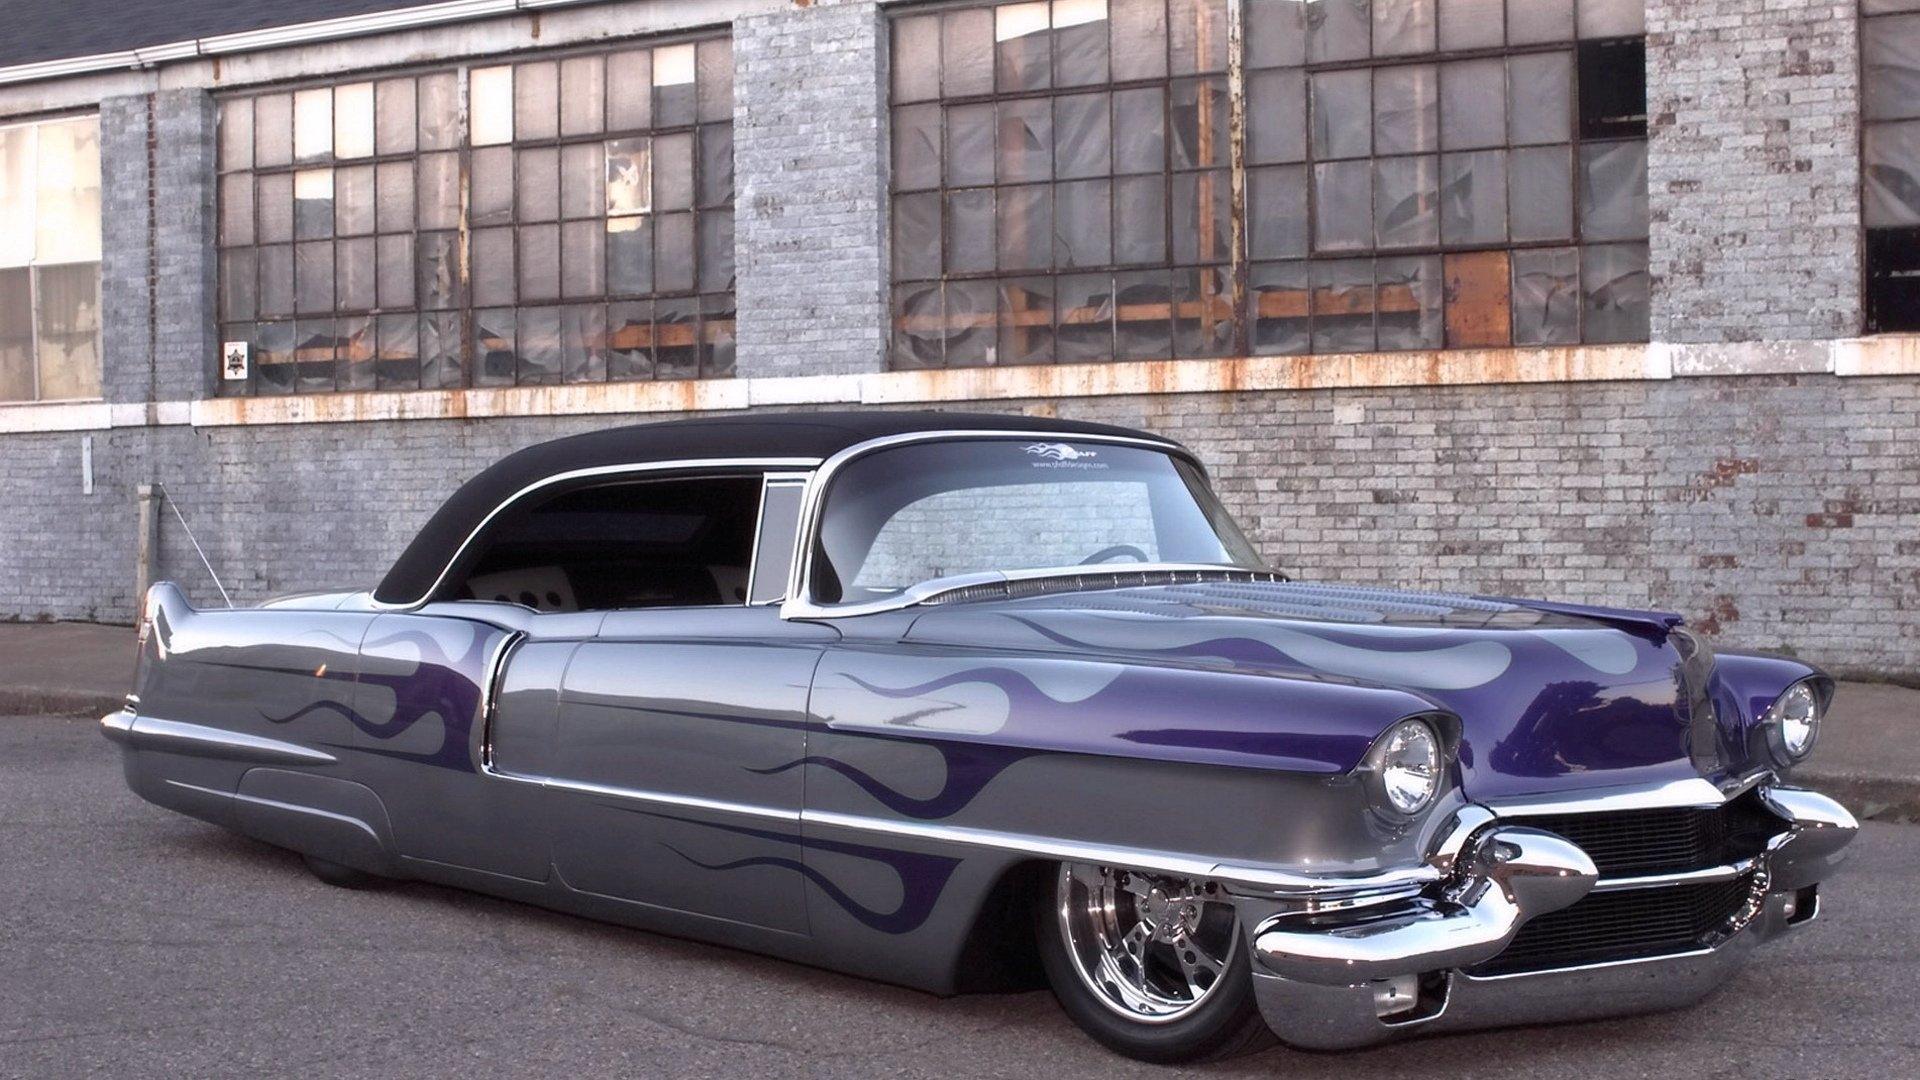 Cadillac Wallpaper Desktop